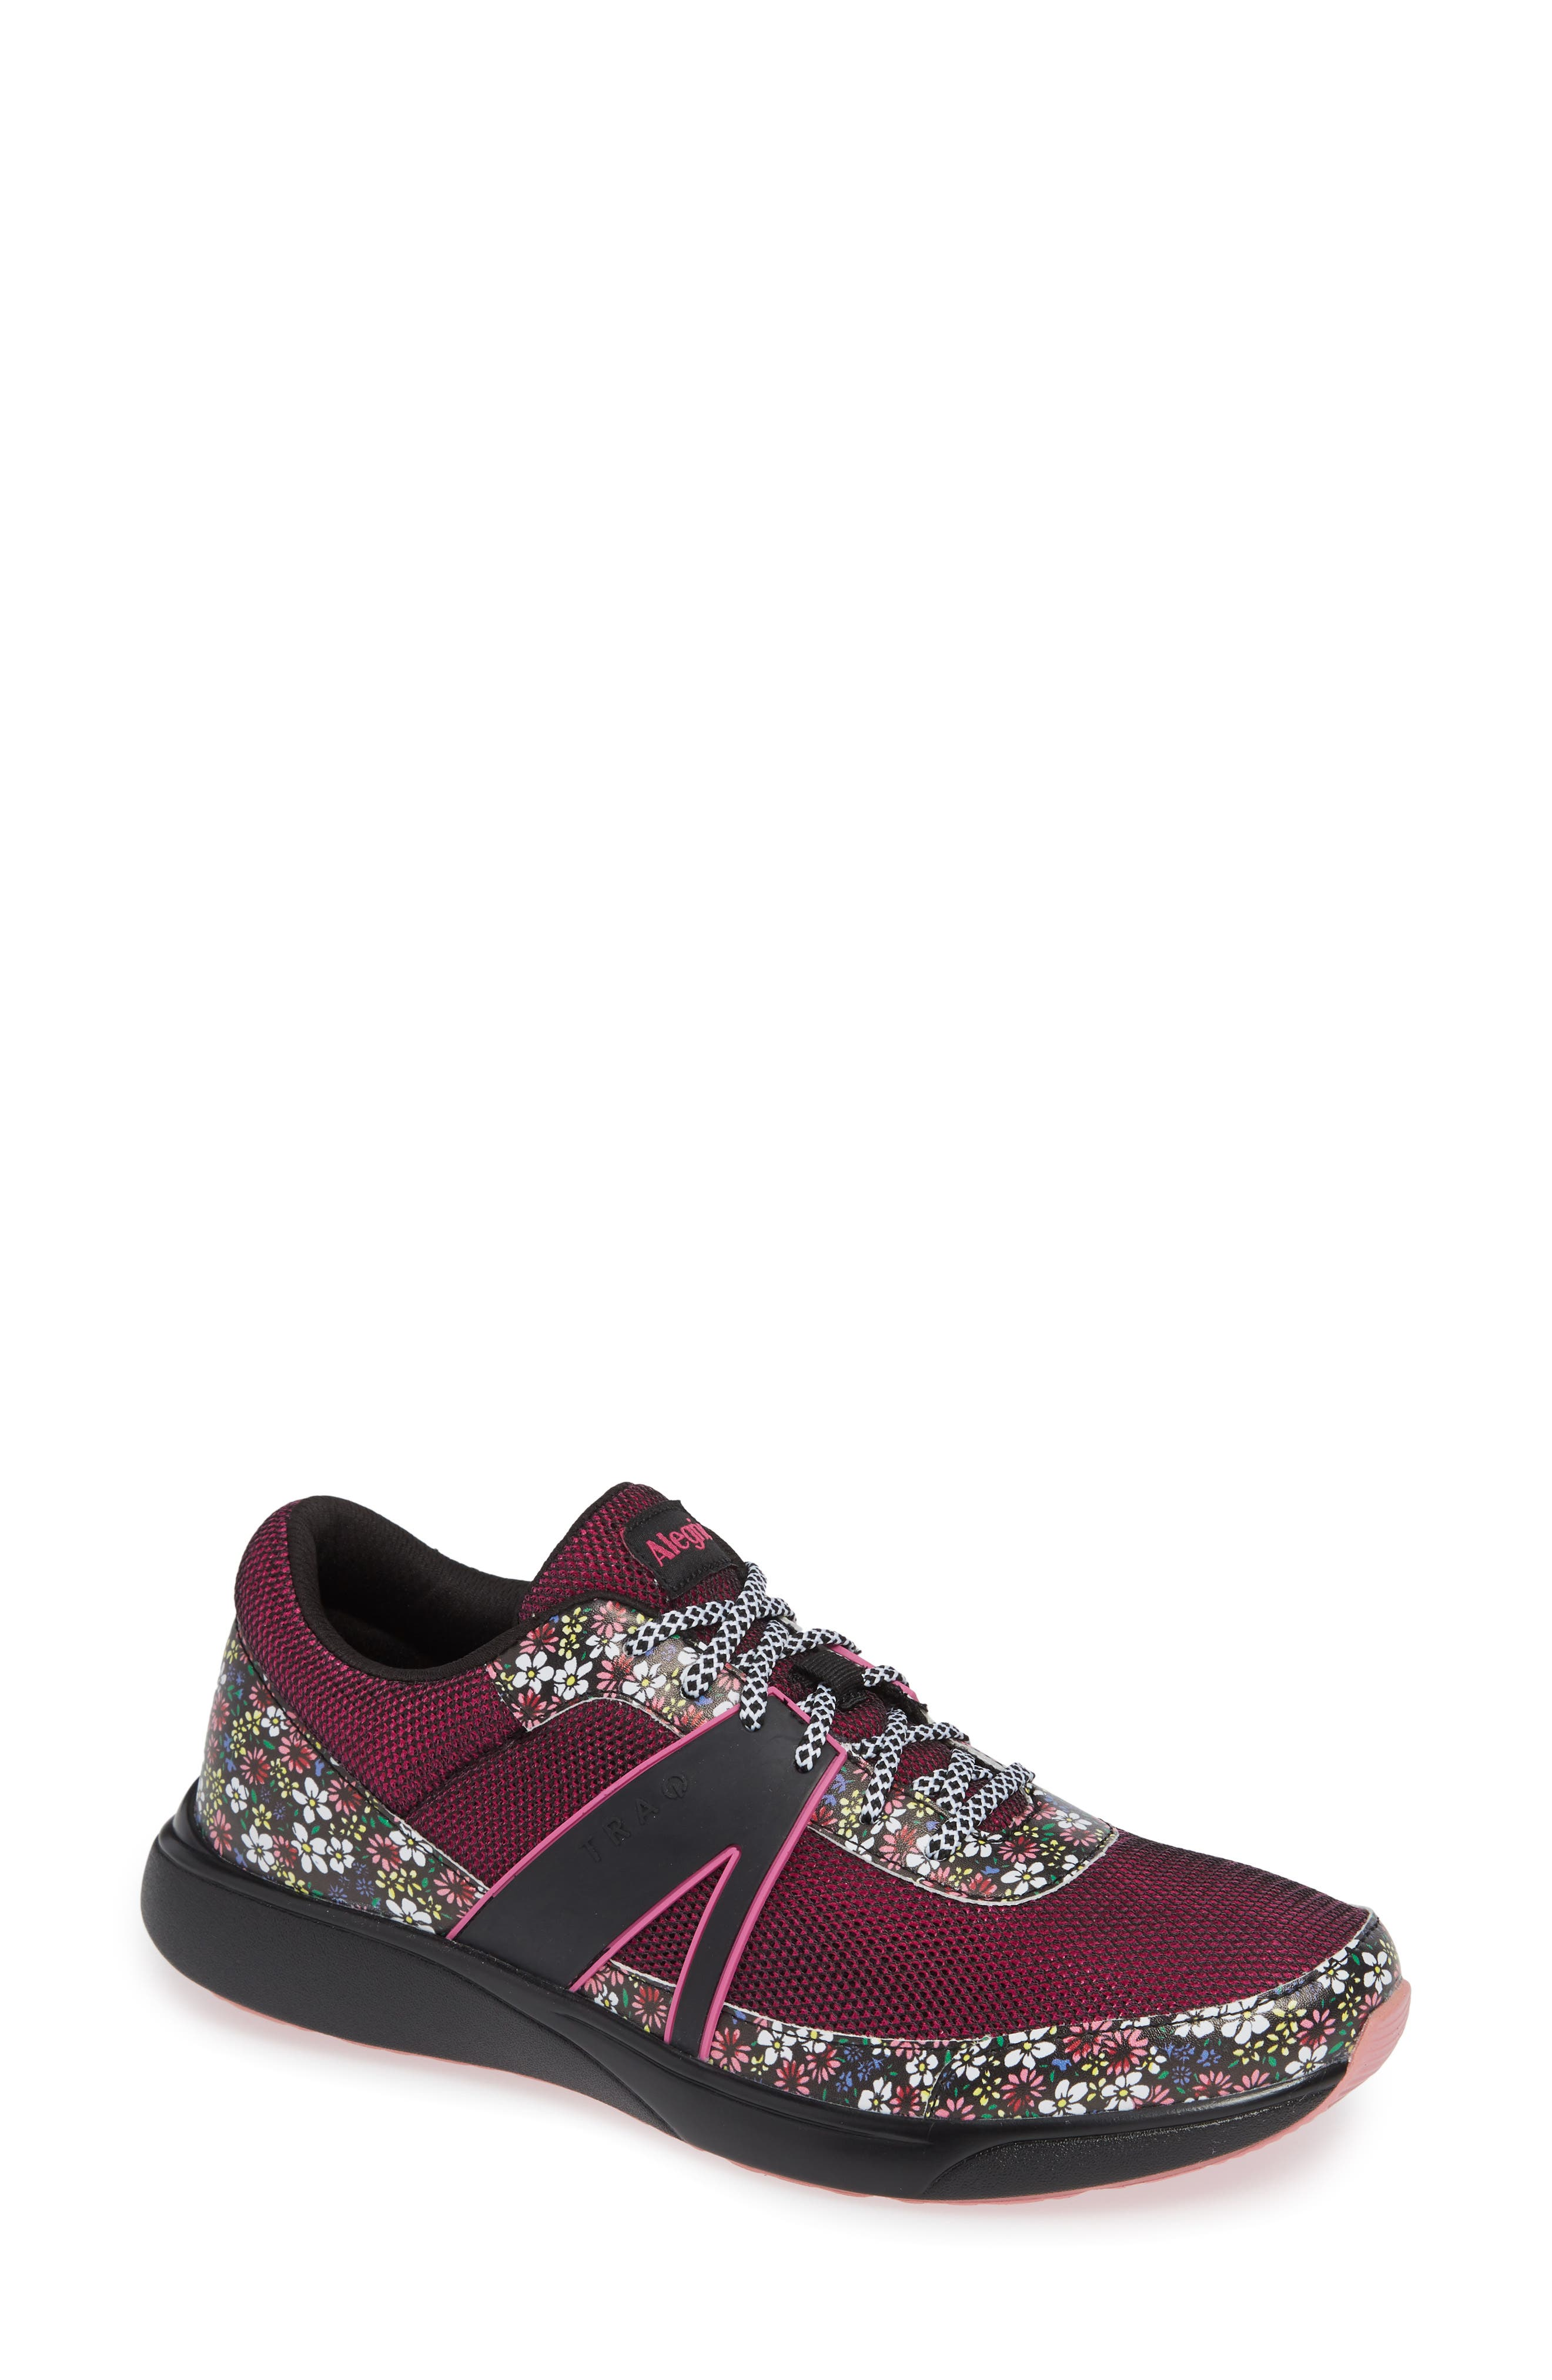 Alegria Qarma Sneaker, Burgundy